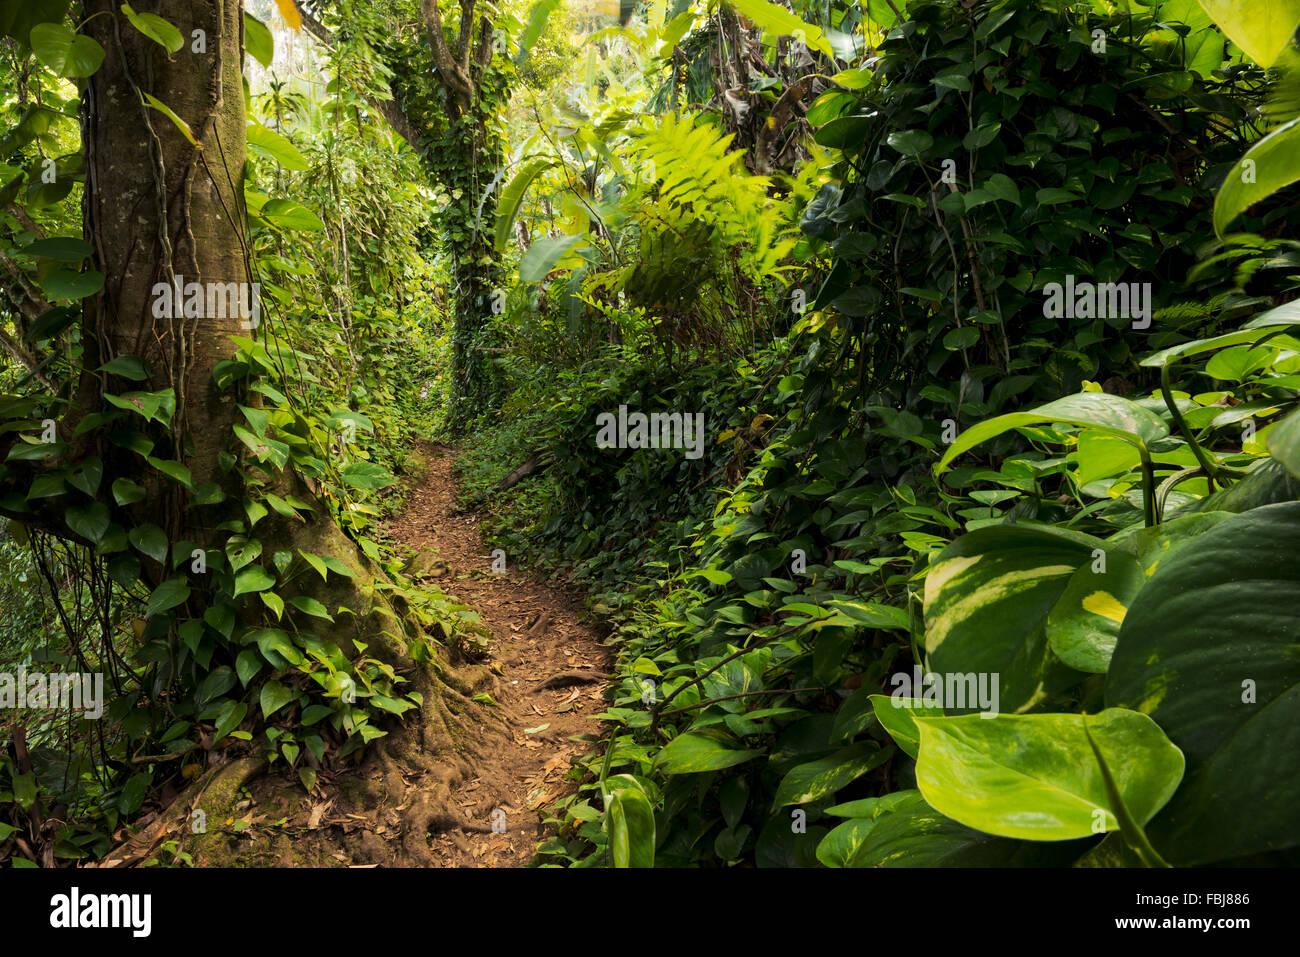 The Caribbean, Guadeloupe, island, jungle, rainforest, dreamlike, path, way, plants, leaves, tree, green, lush, - Stock Image